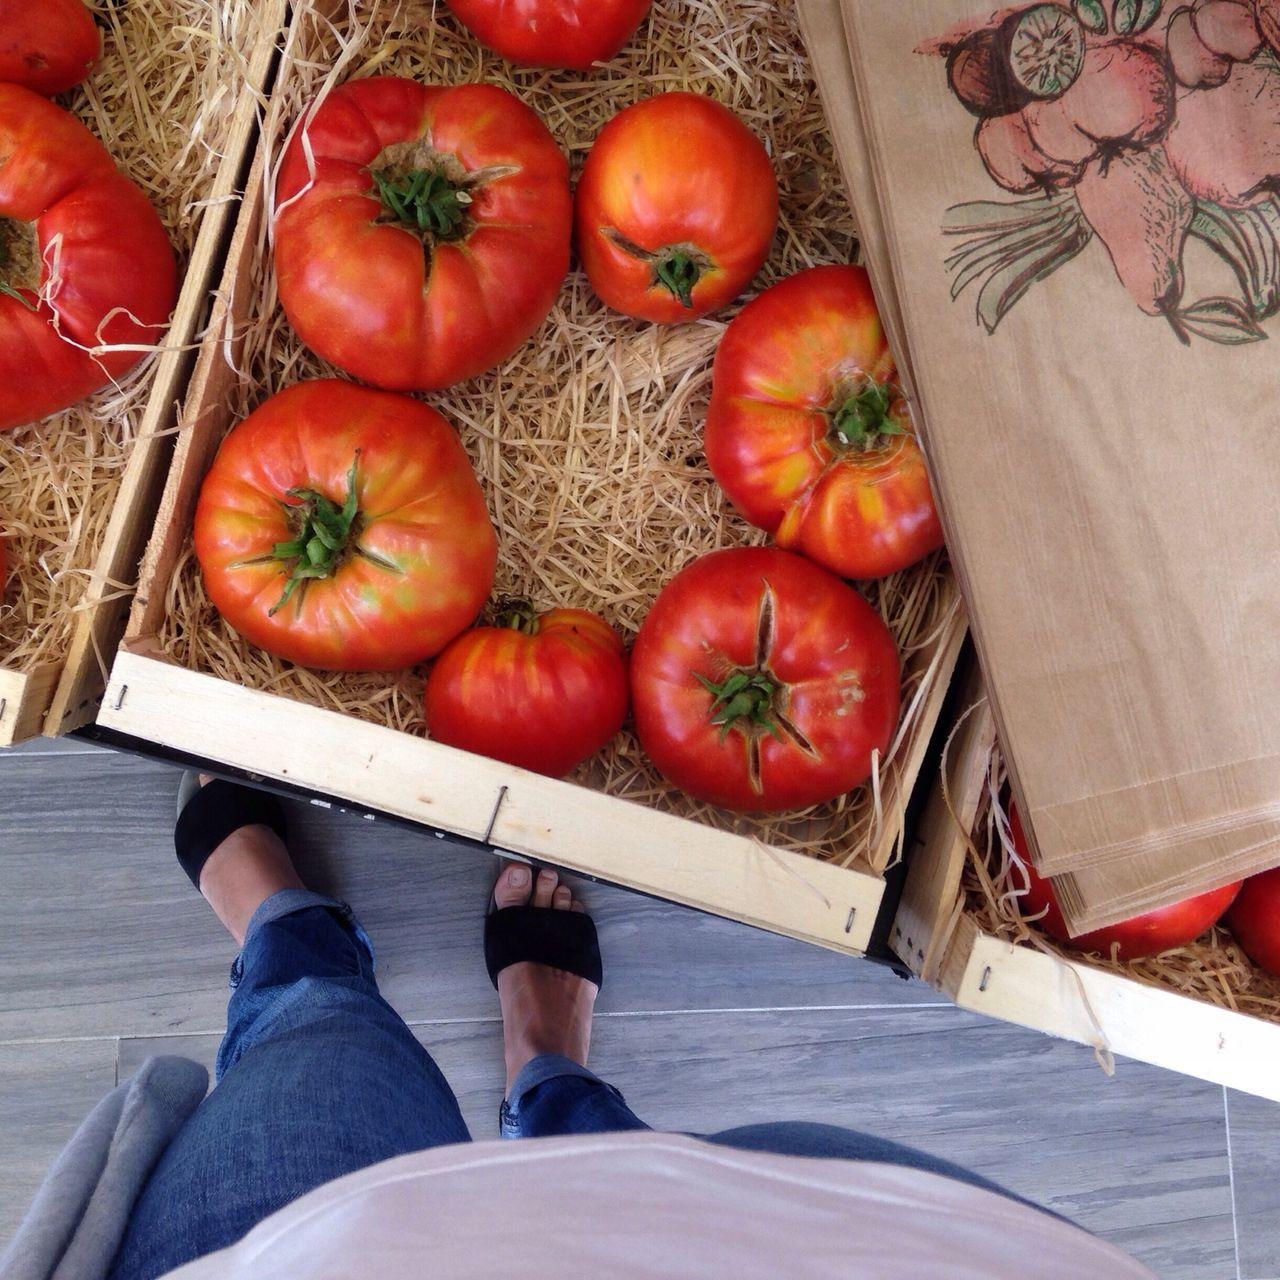 Food Shopping Veggies Organic Tomatoes Biodiversity